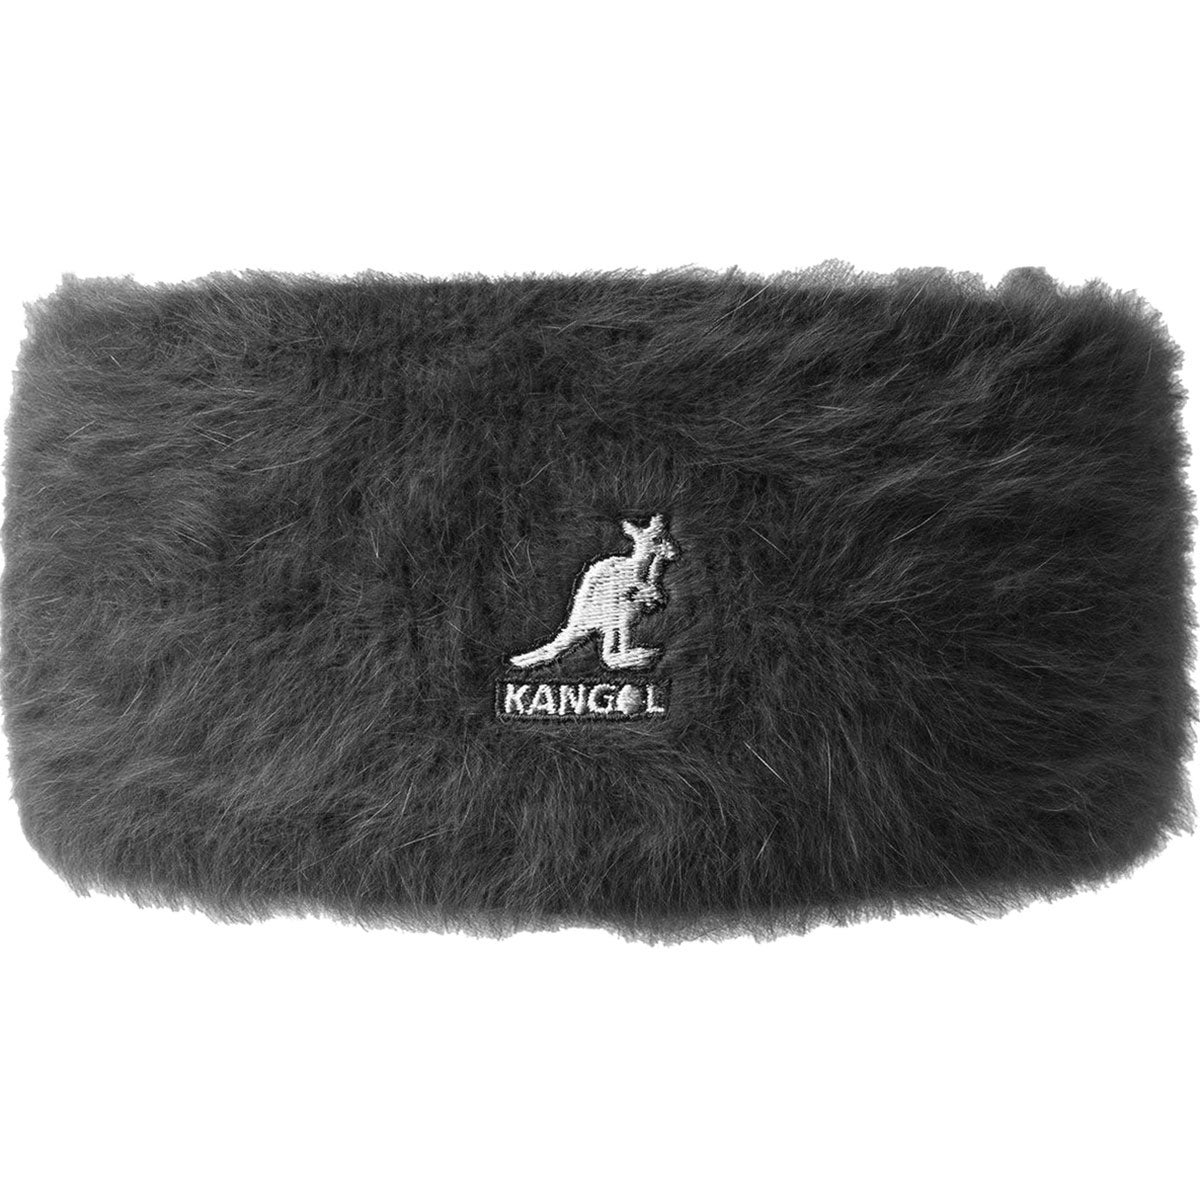 Kangol Furgora Headband in Black